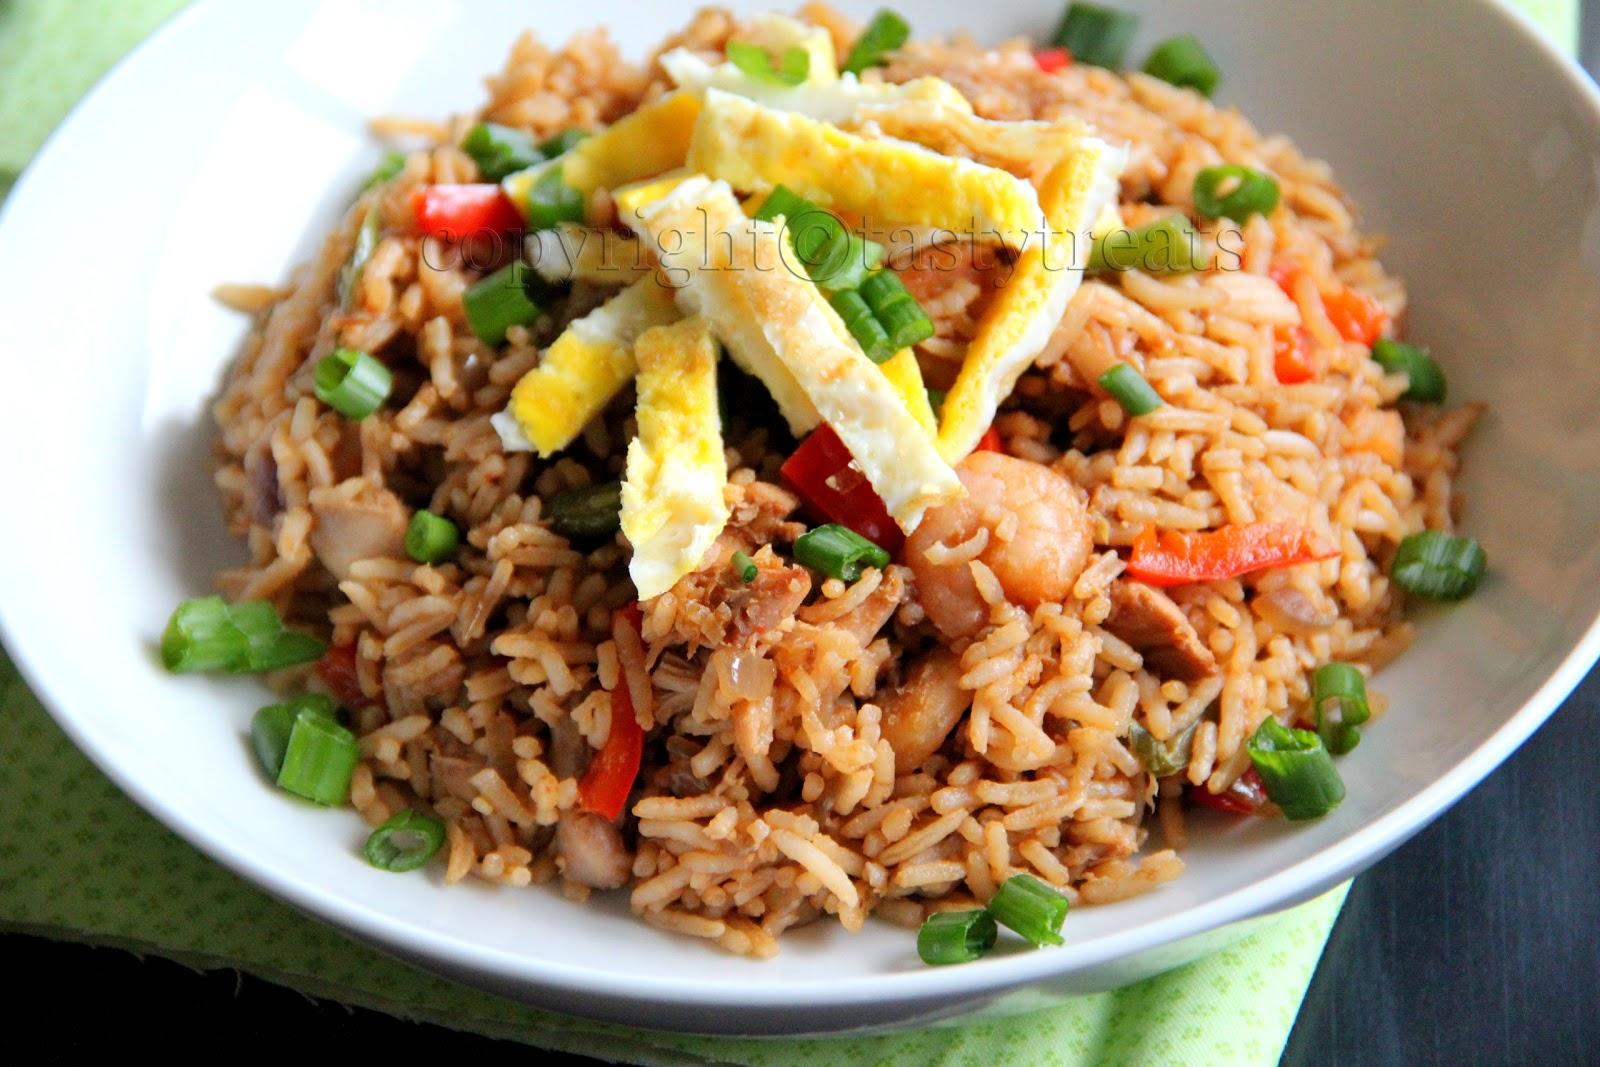 Tasty Treats: Nasi Goreng - Indonesian Fried Rice